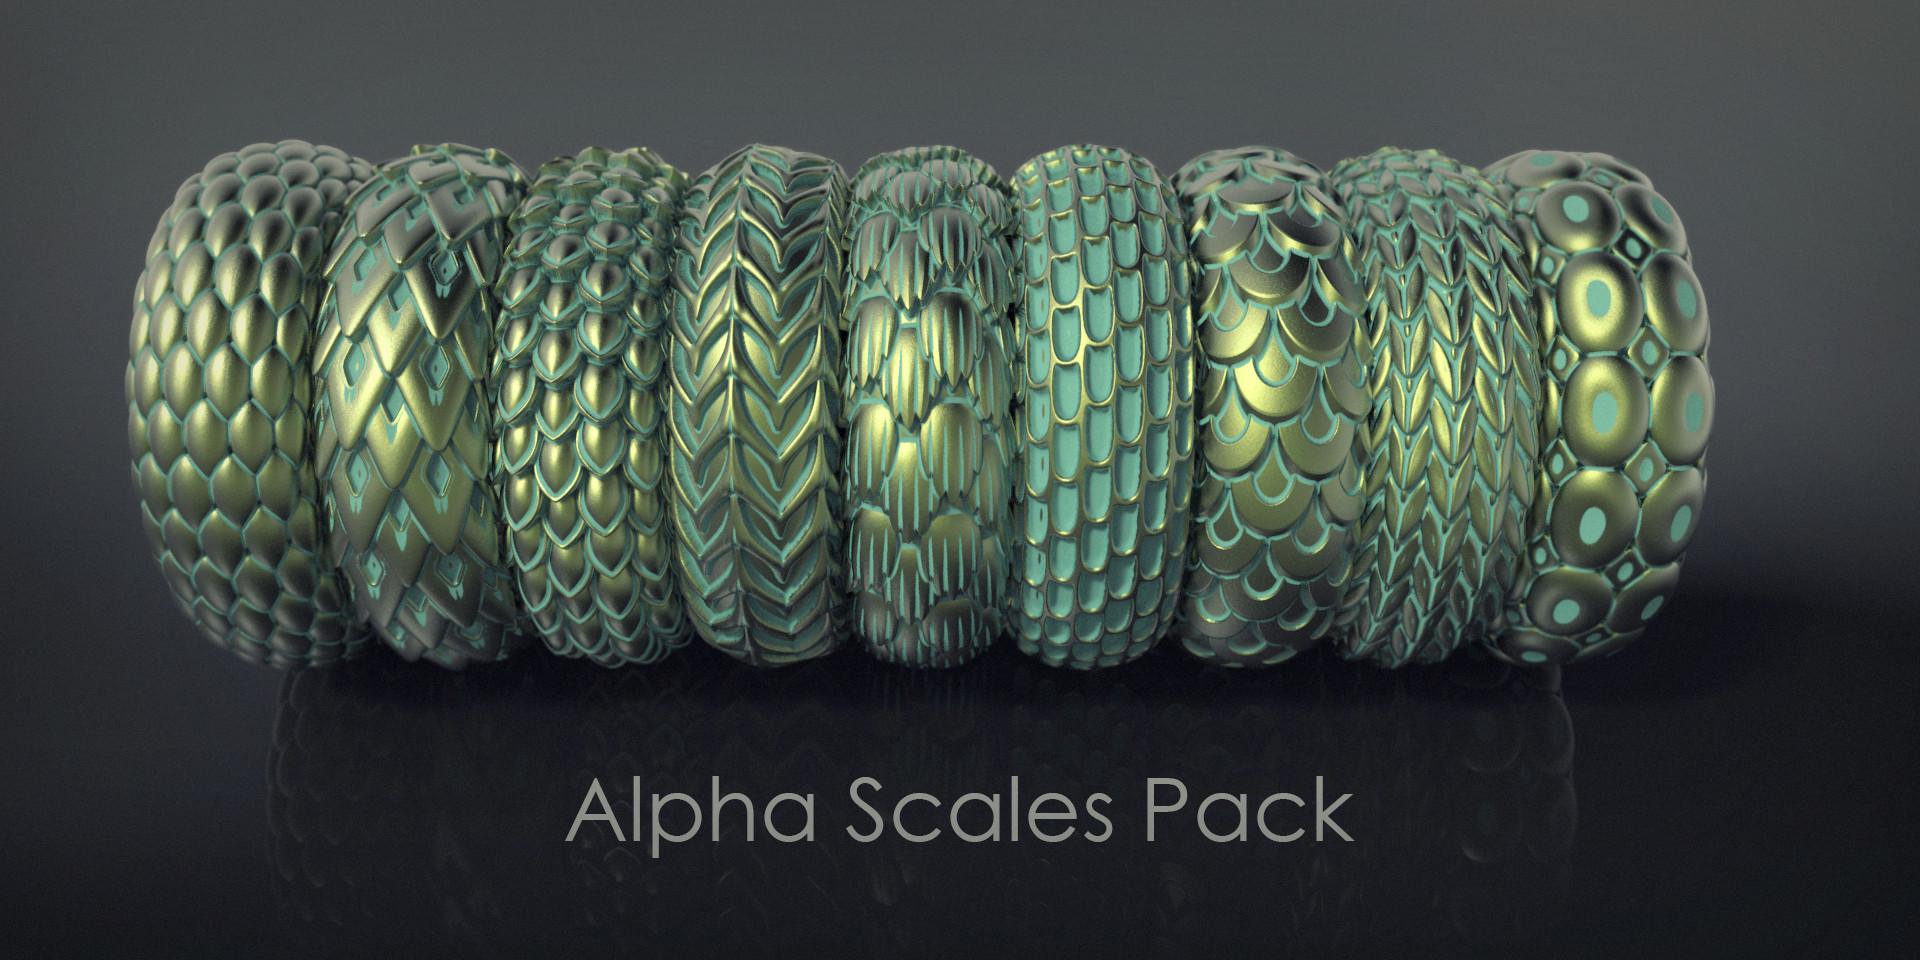 Nacho riesco gostanza alpha scales pack3